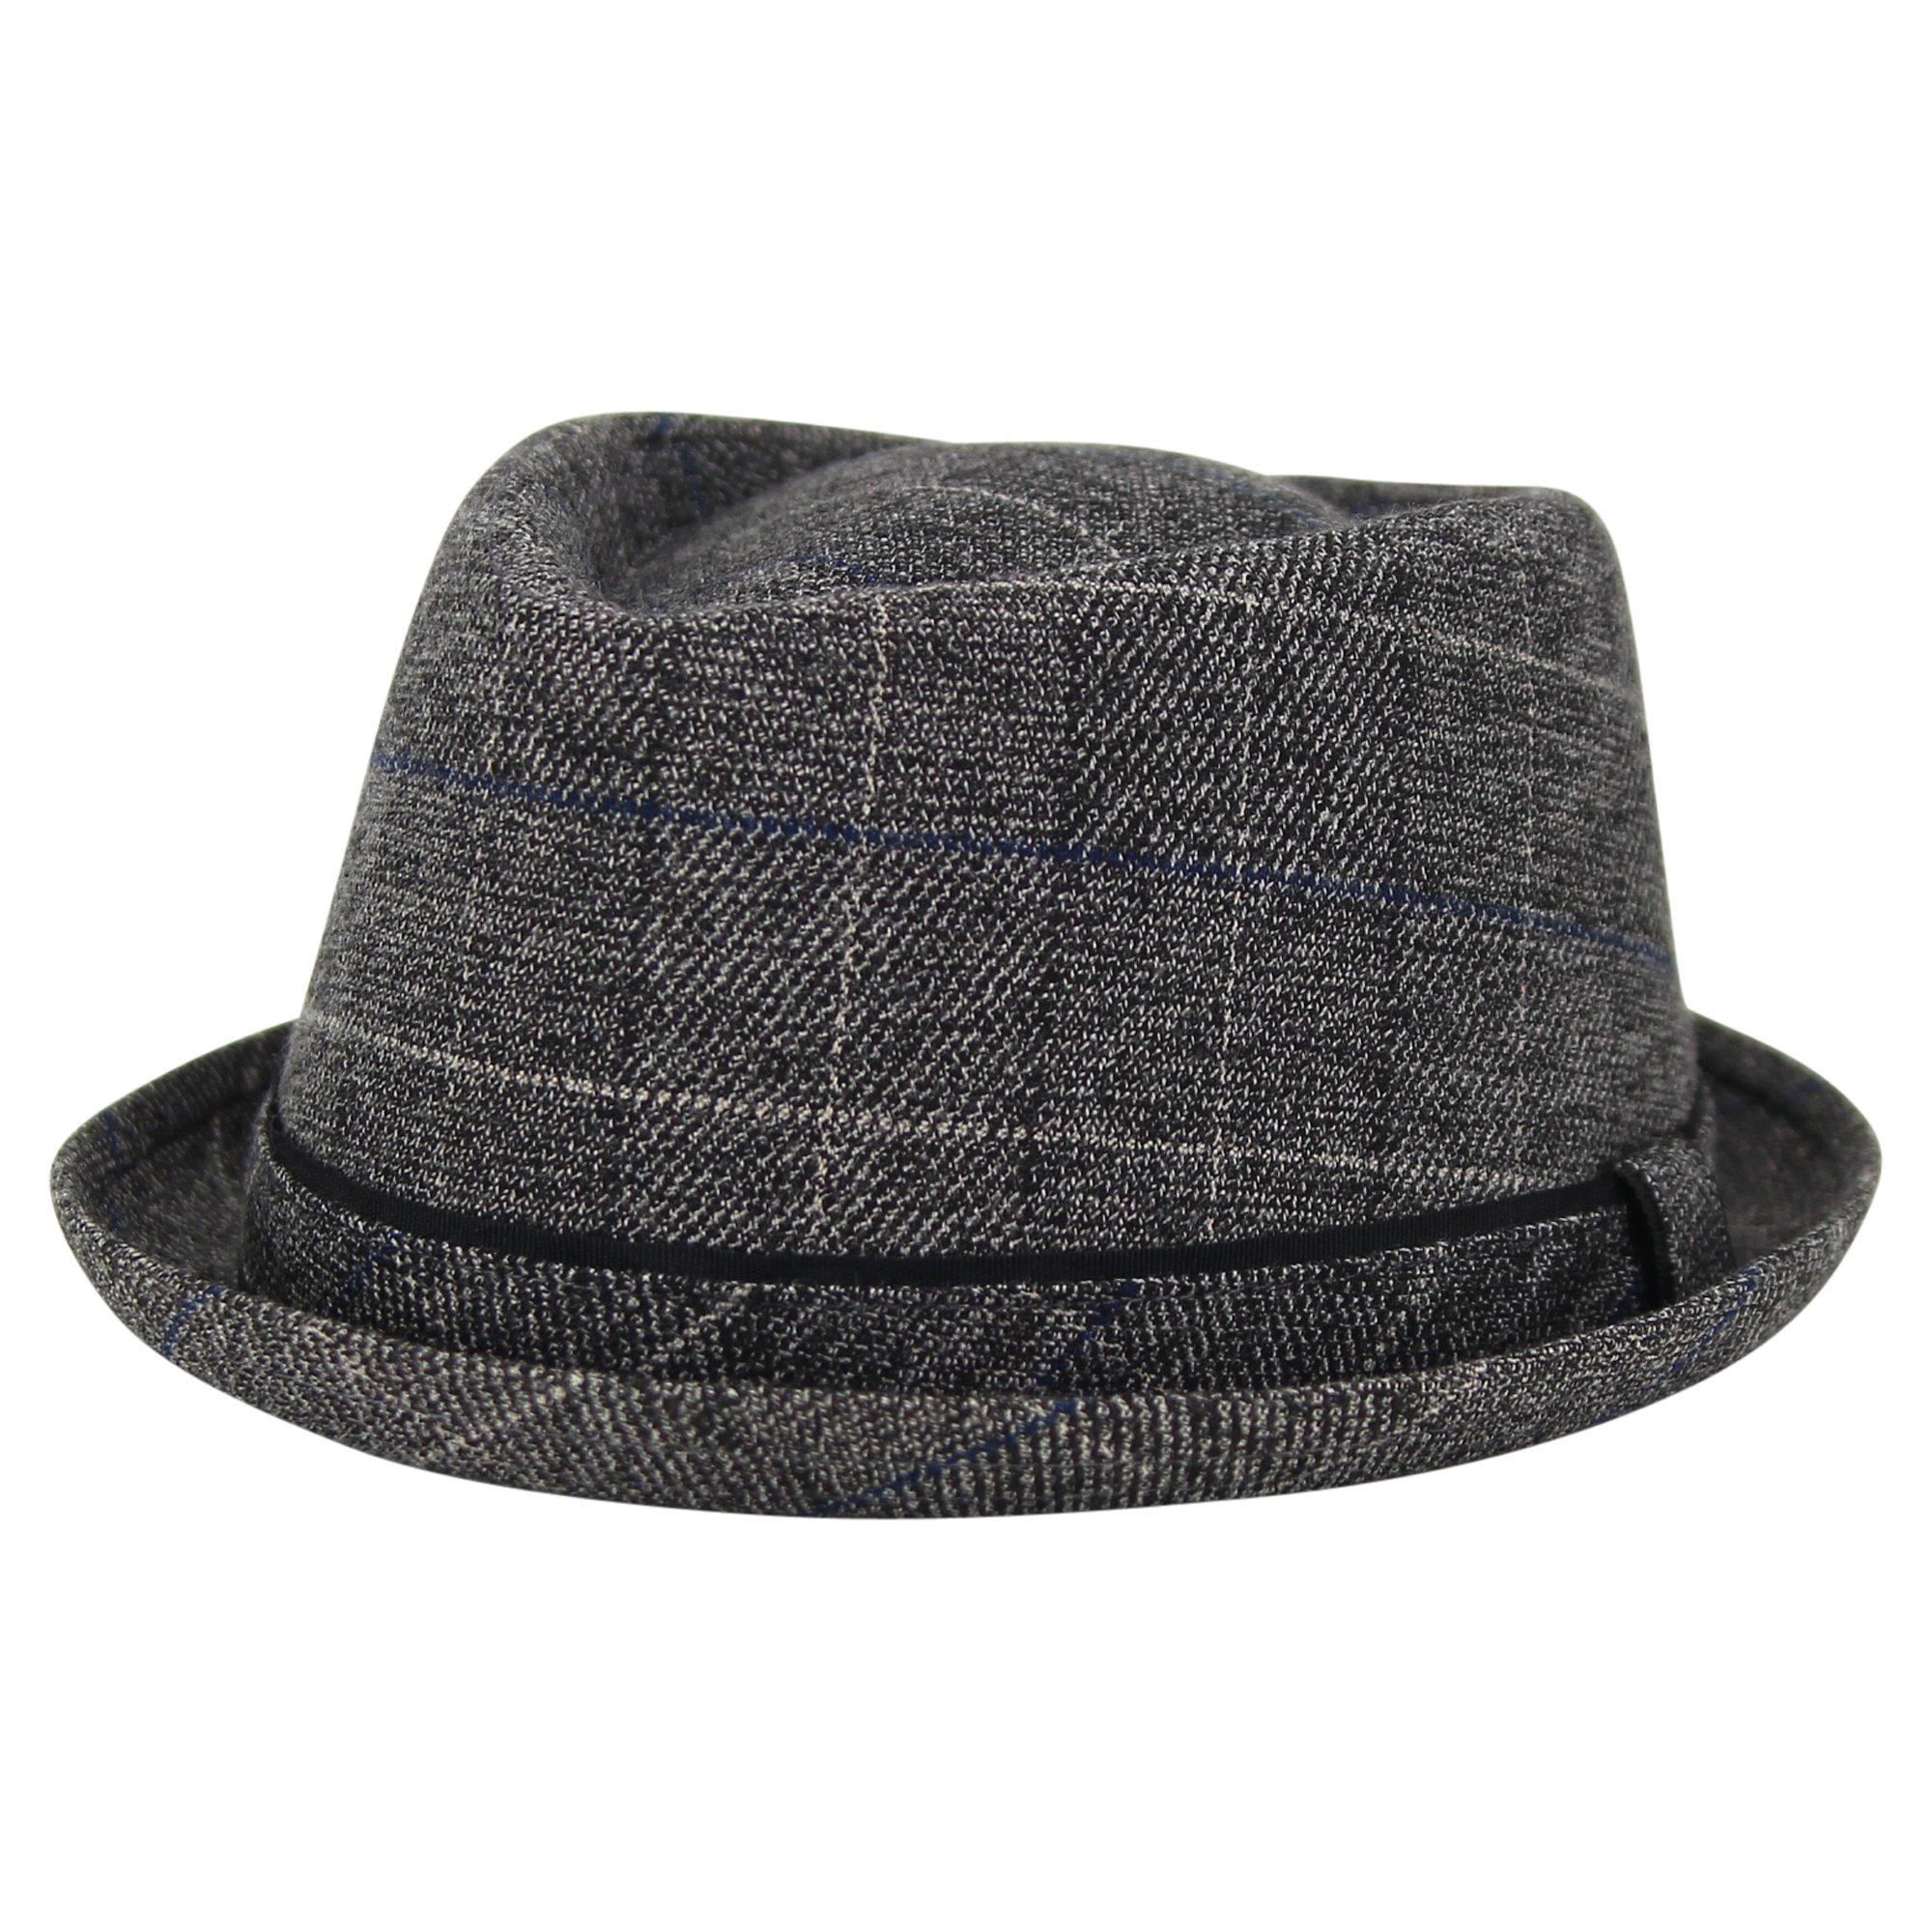 London Fog Heritage Men's Short Brim Fedora Hat (Charcoal, Small/Medium)